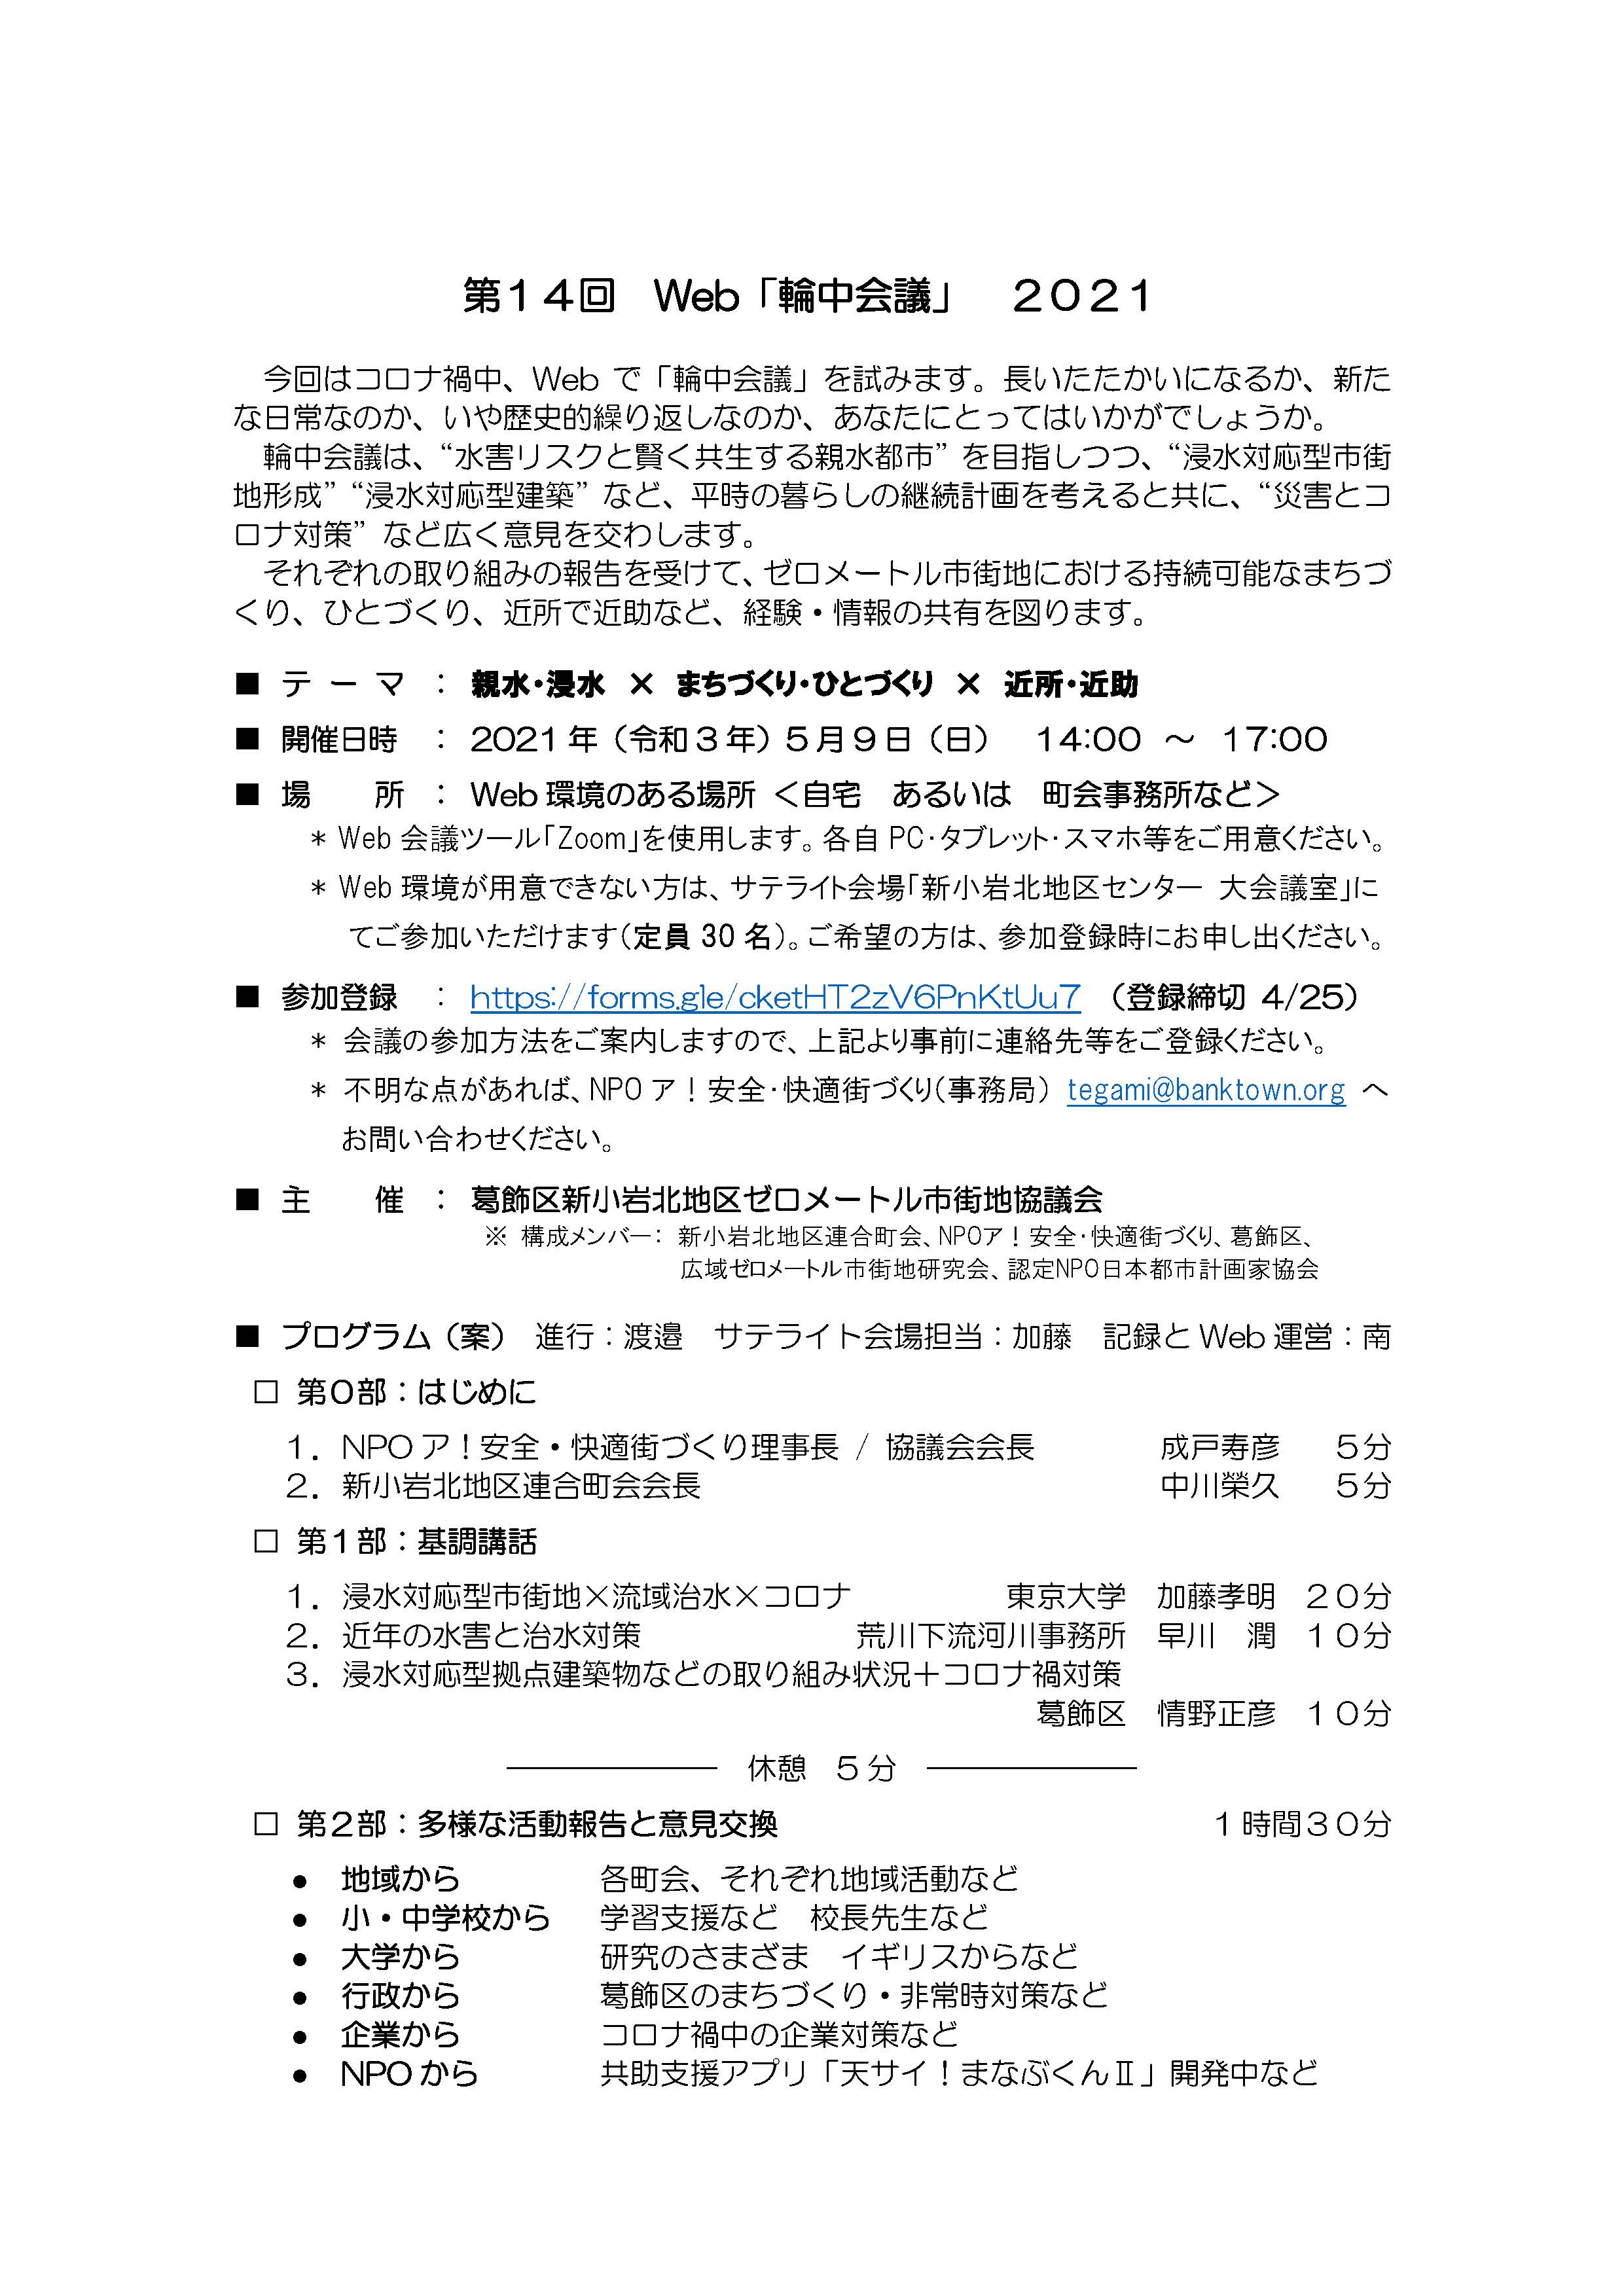 http://www.banktown.org/workshop/img/01_web_wajyu.jpg